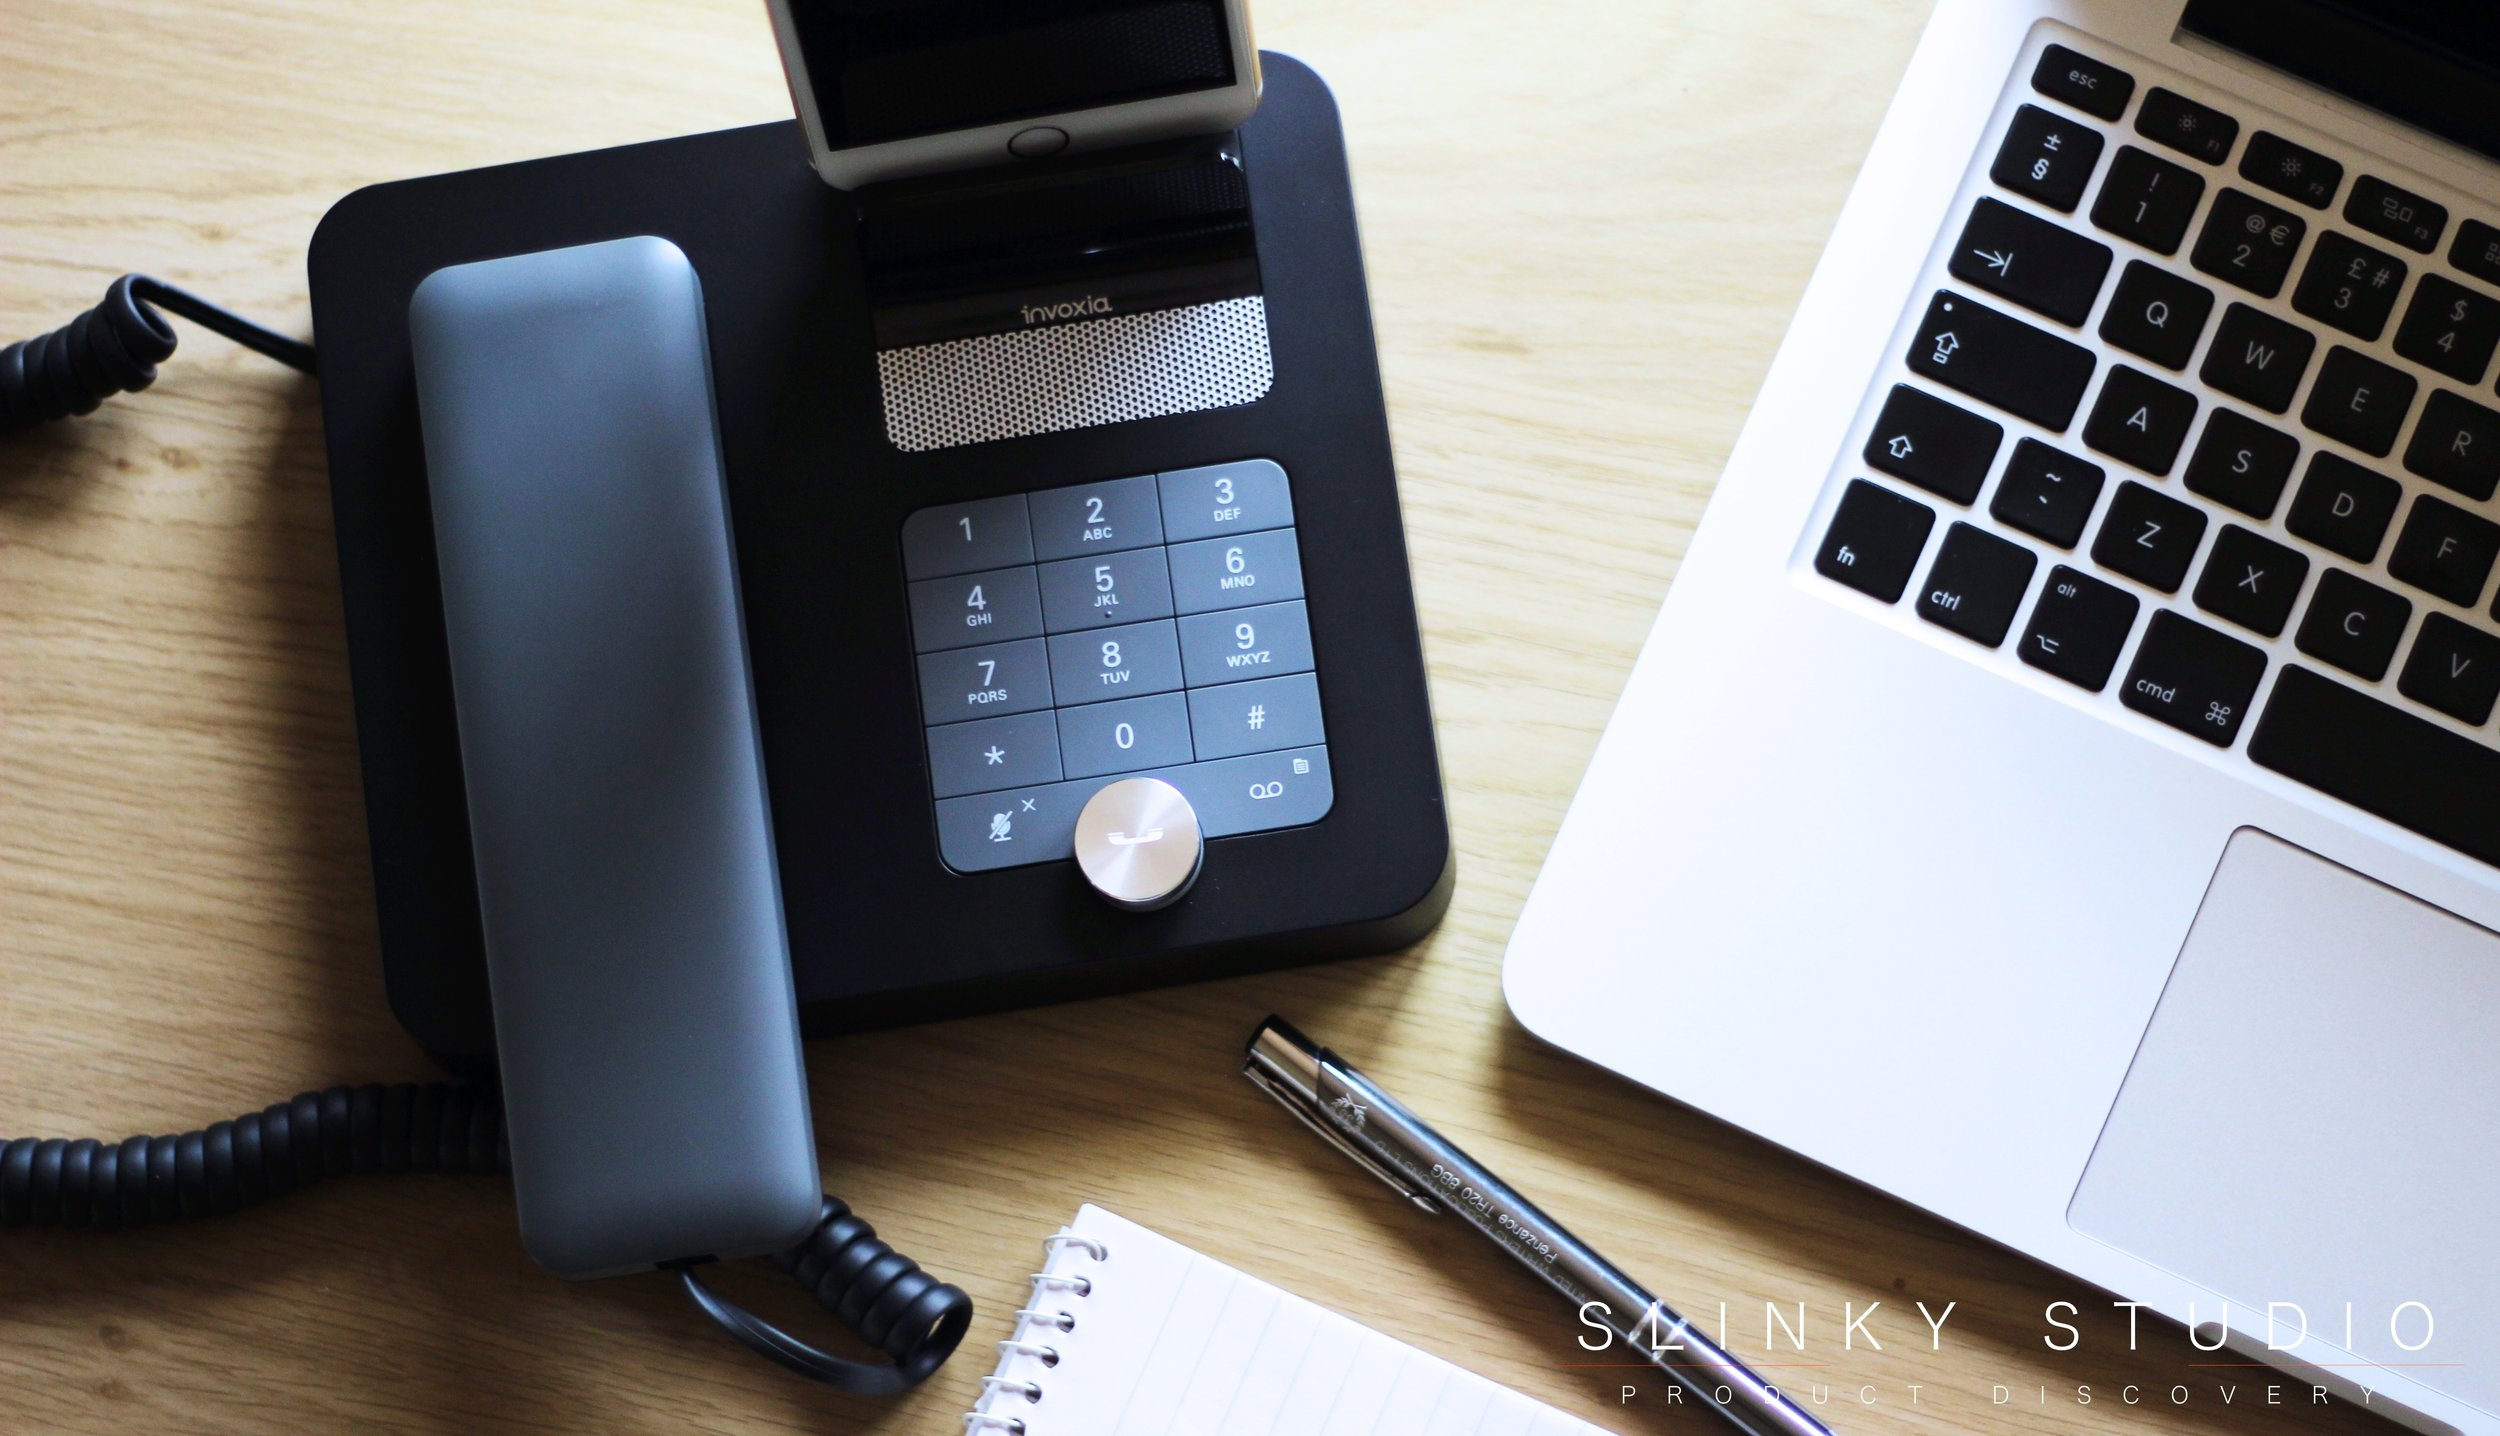 Invoxia NVX 200 Desk Phone with iPhone 6s Plus.jpg